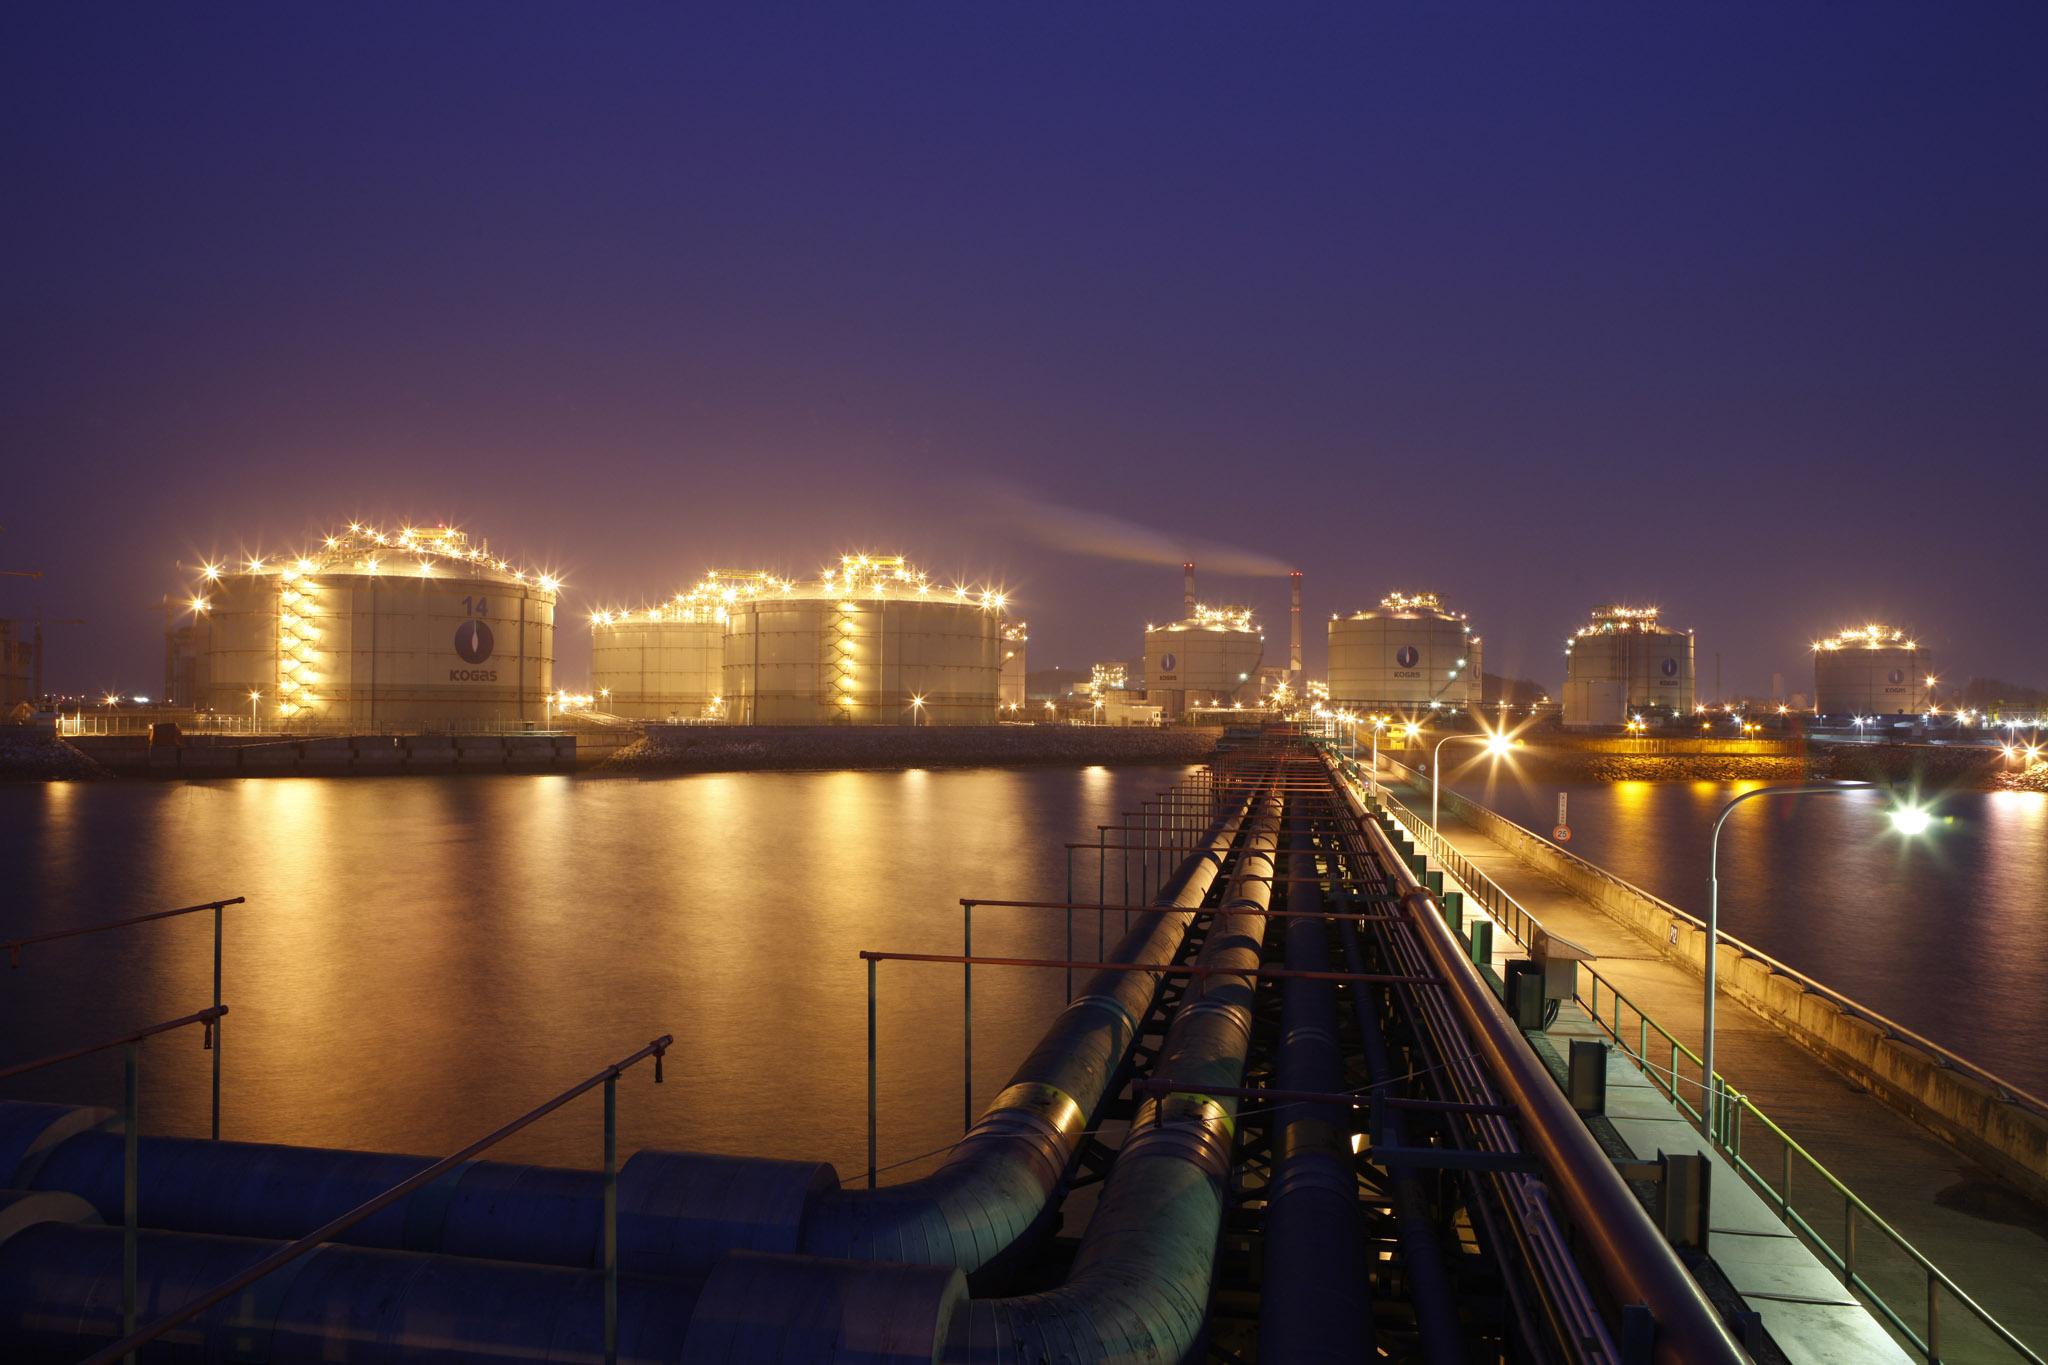 Shell_South-Gas_Mitsubishi_Basra-Gas_LNG_Export_Terminal_Saipem_FEED_Project